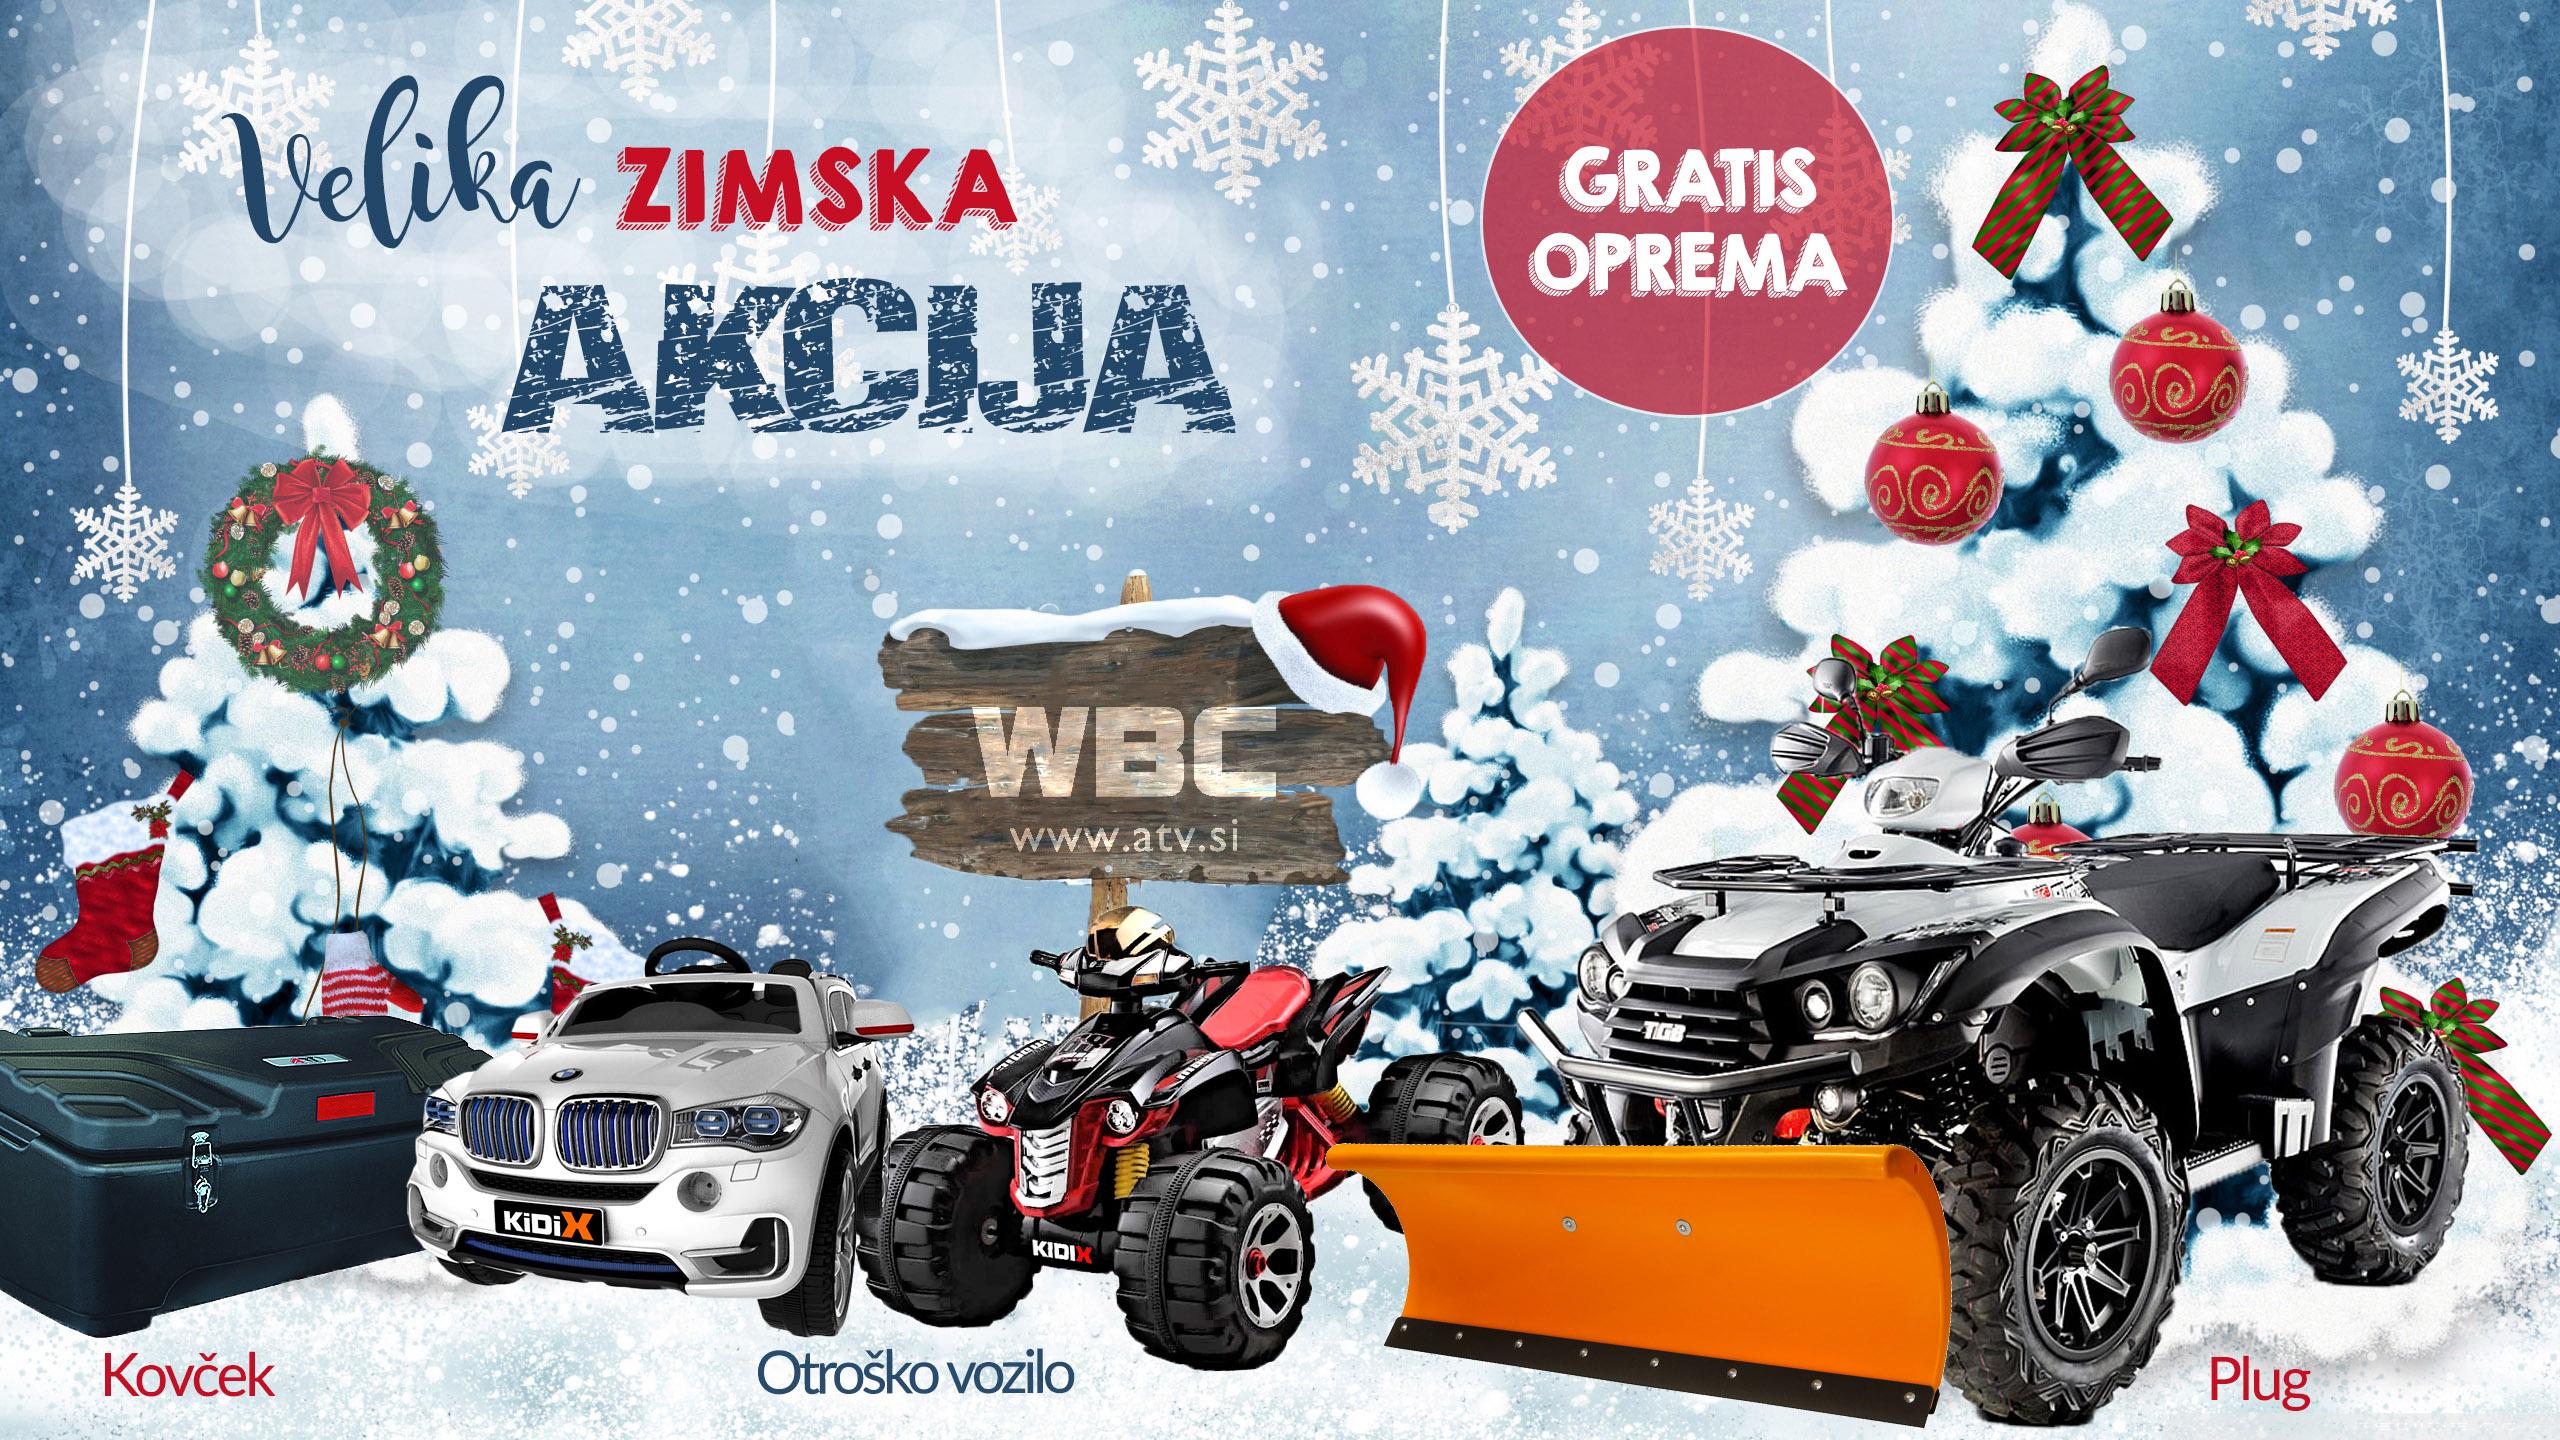 zimska-akcija-gratis-oprema-kidix-plug